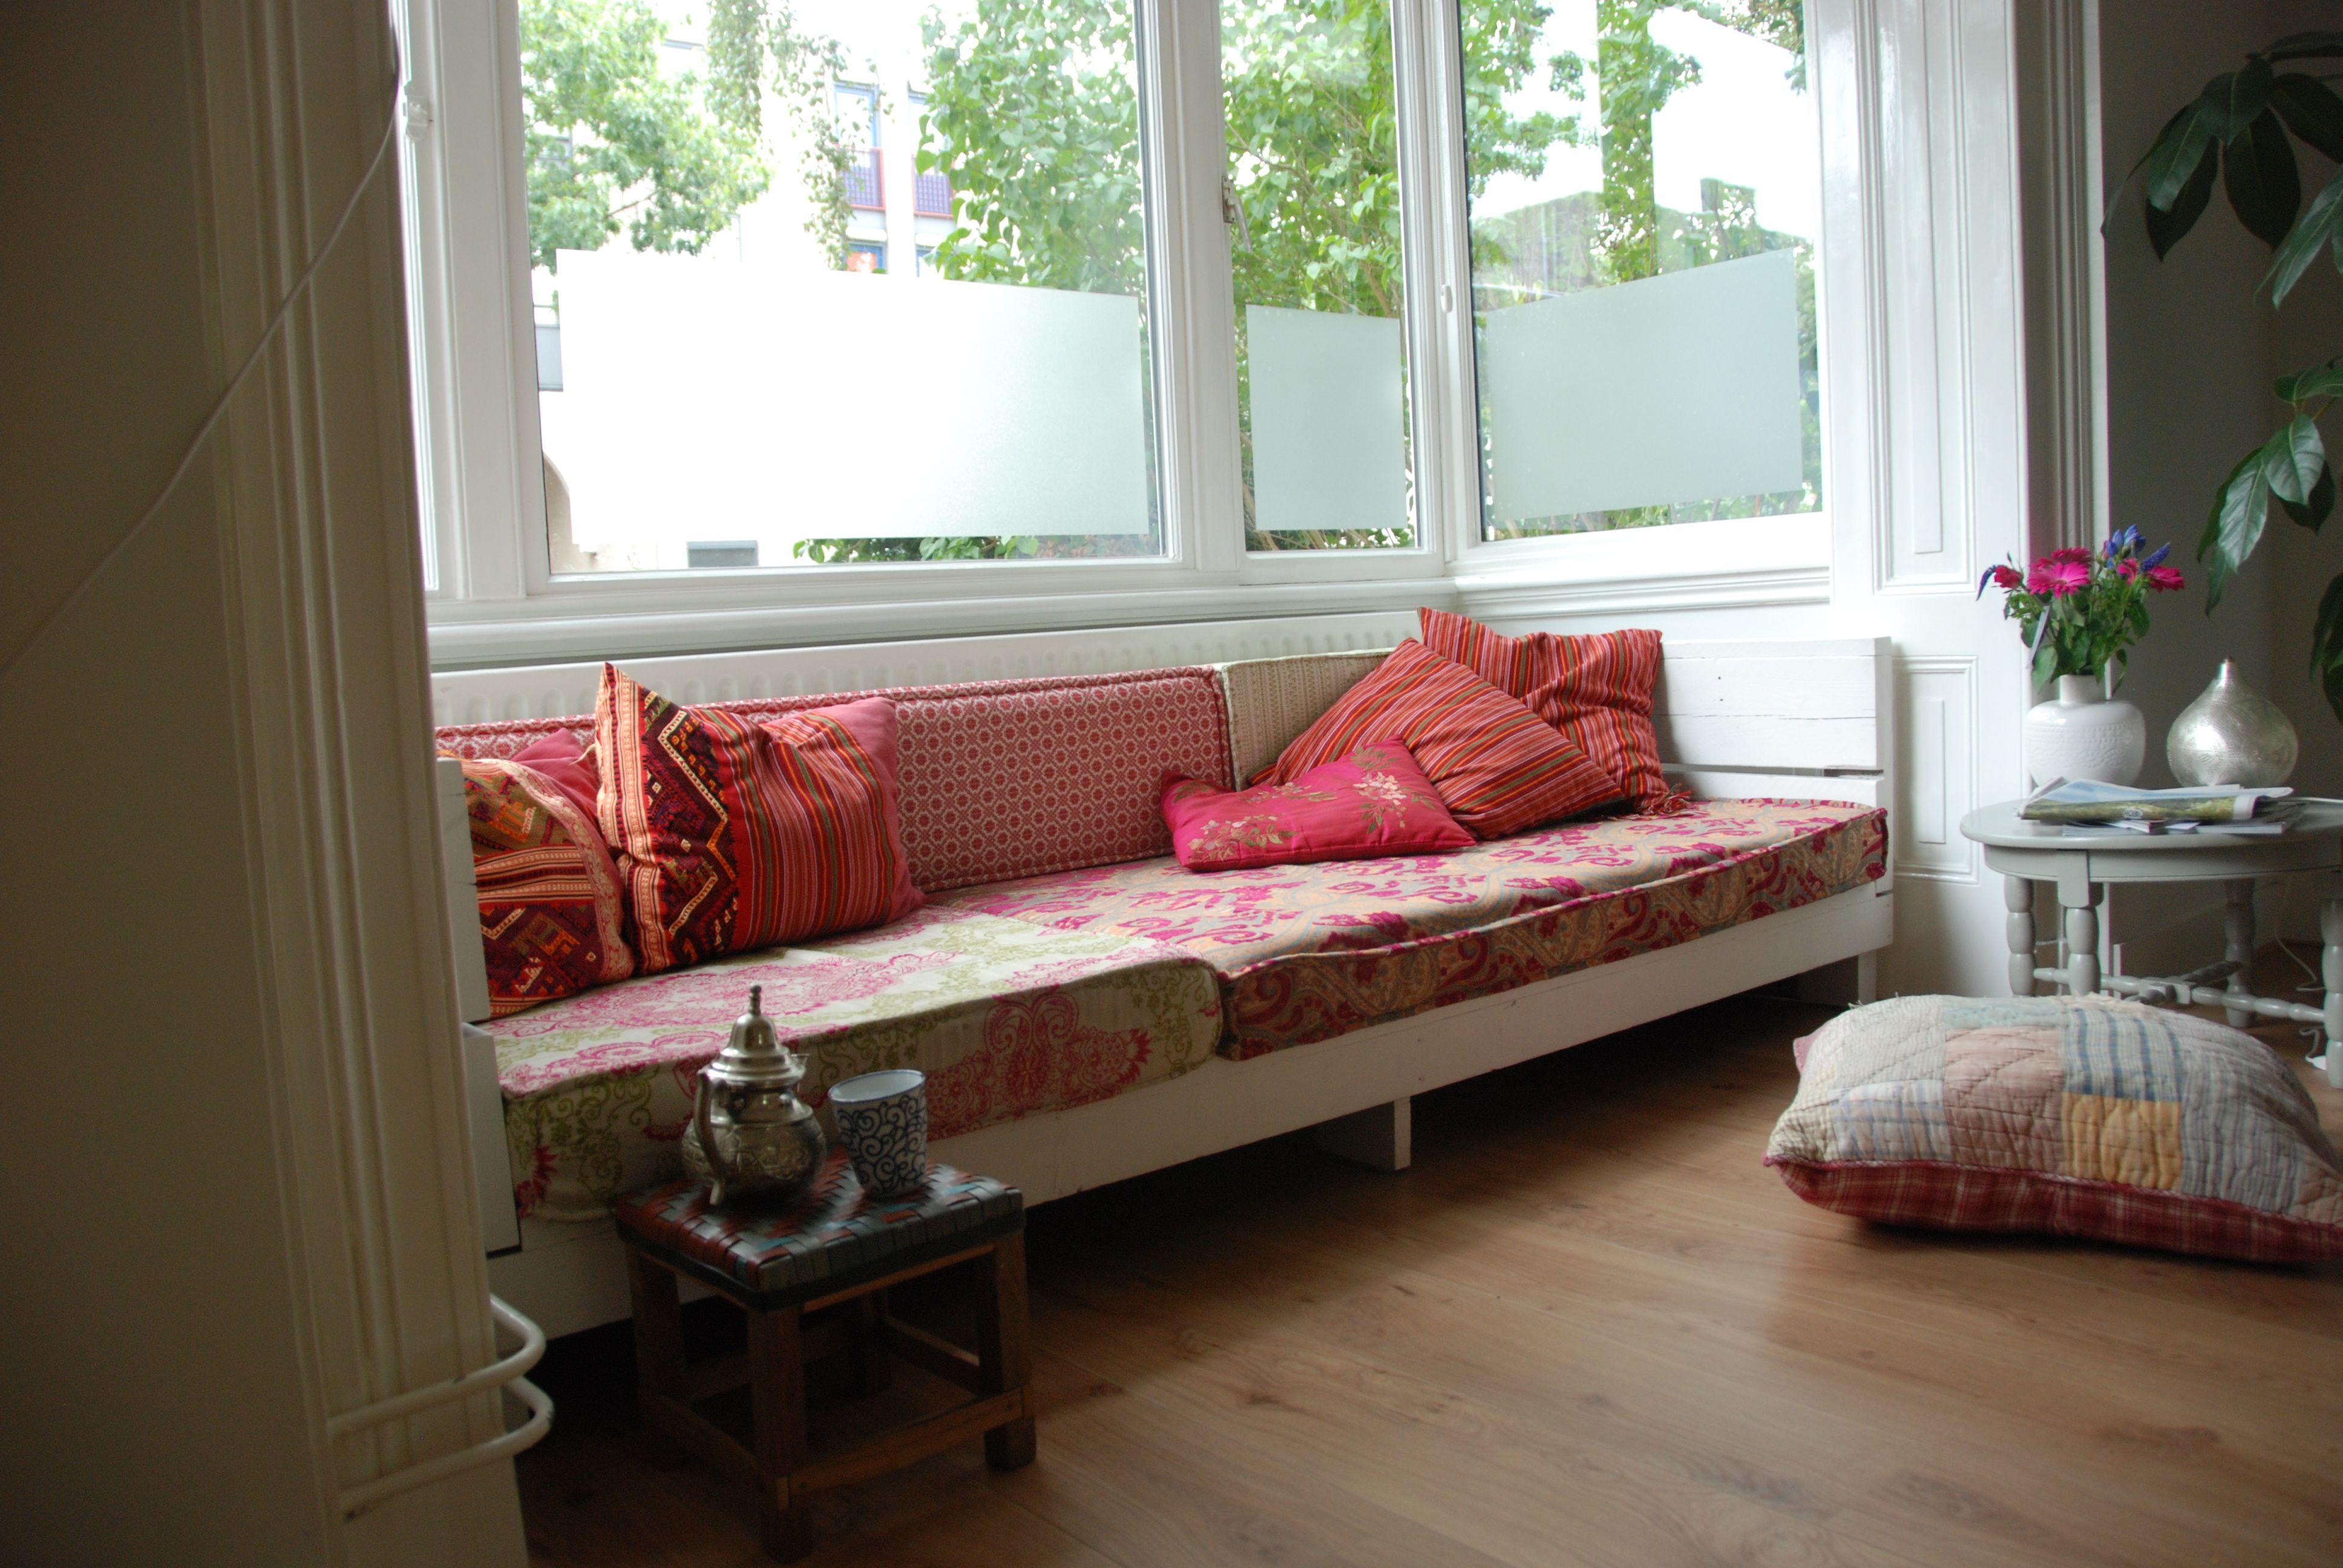 Erker matraskussens kleur bankjes pinterest kleur marokkaans interieur en huiskamer - Kleur van meisjeskamers ...